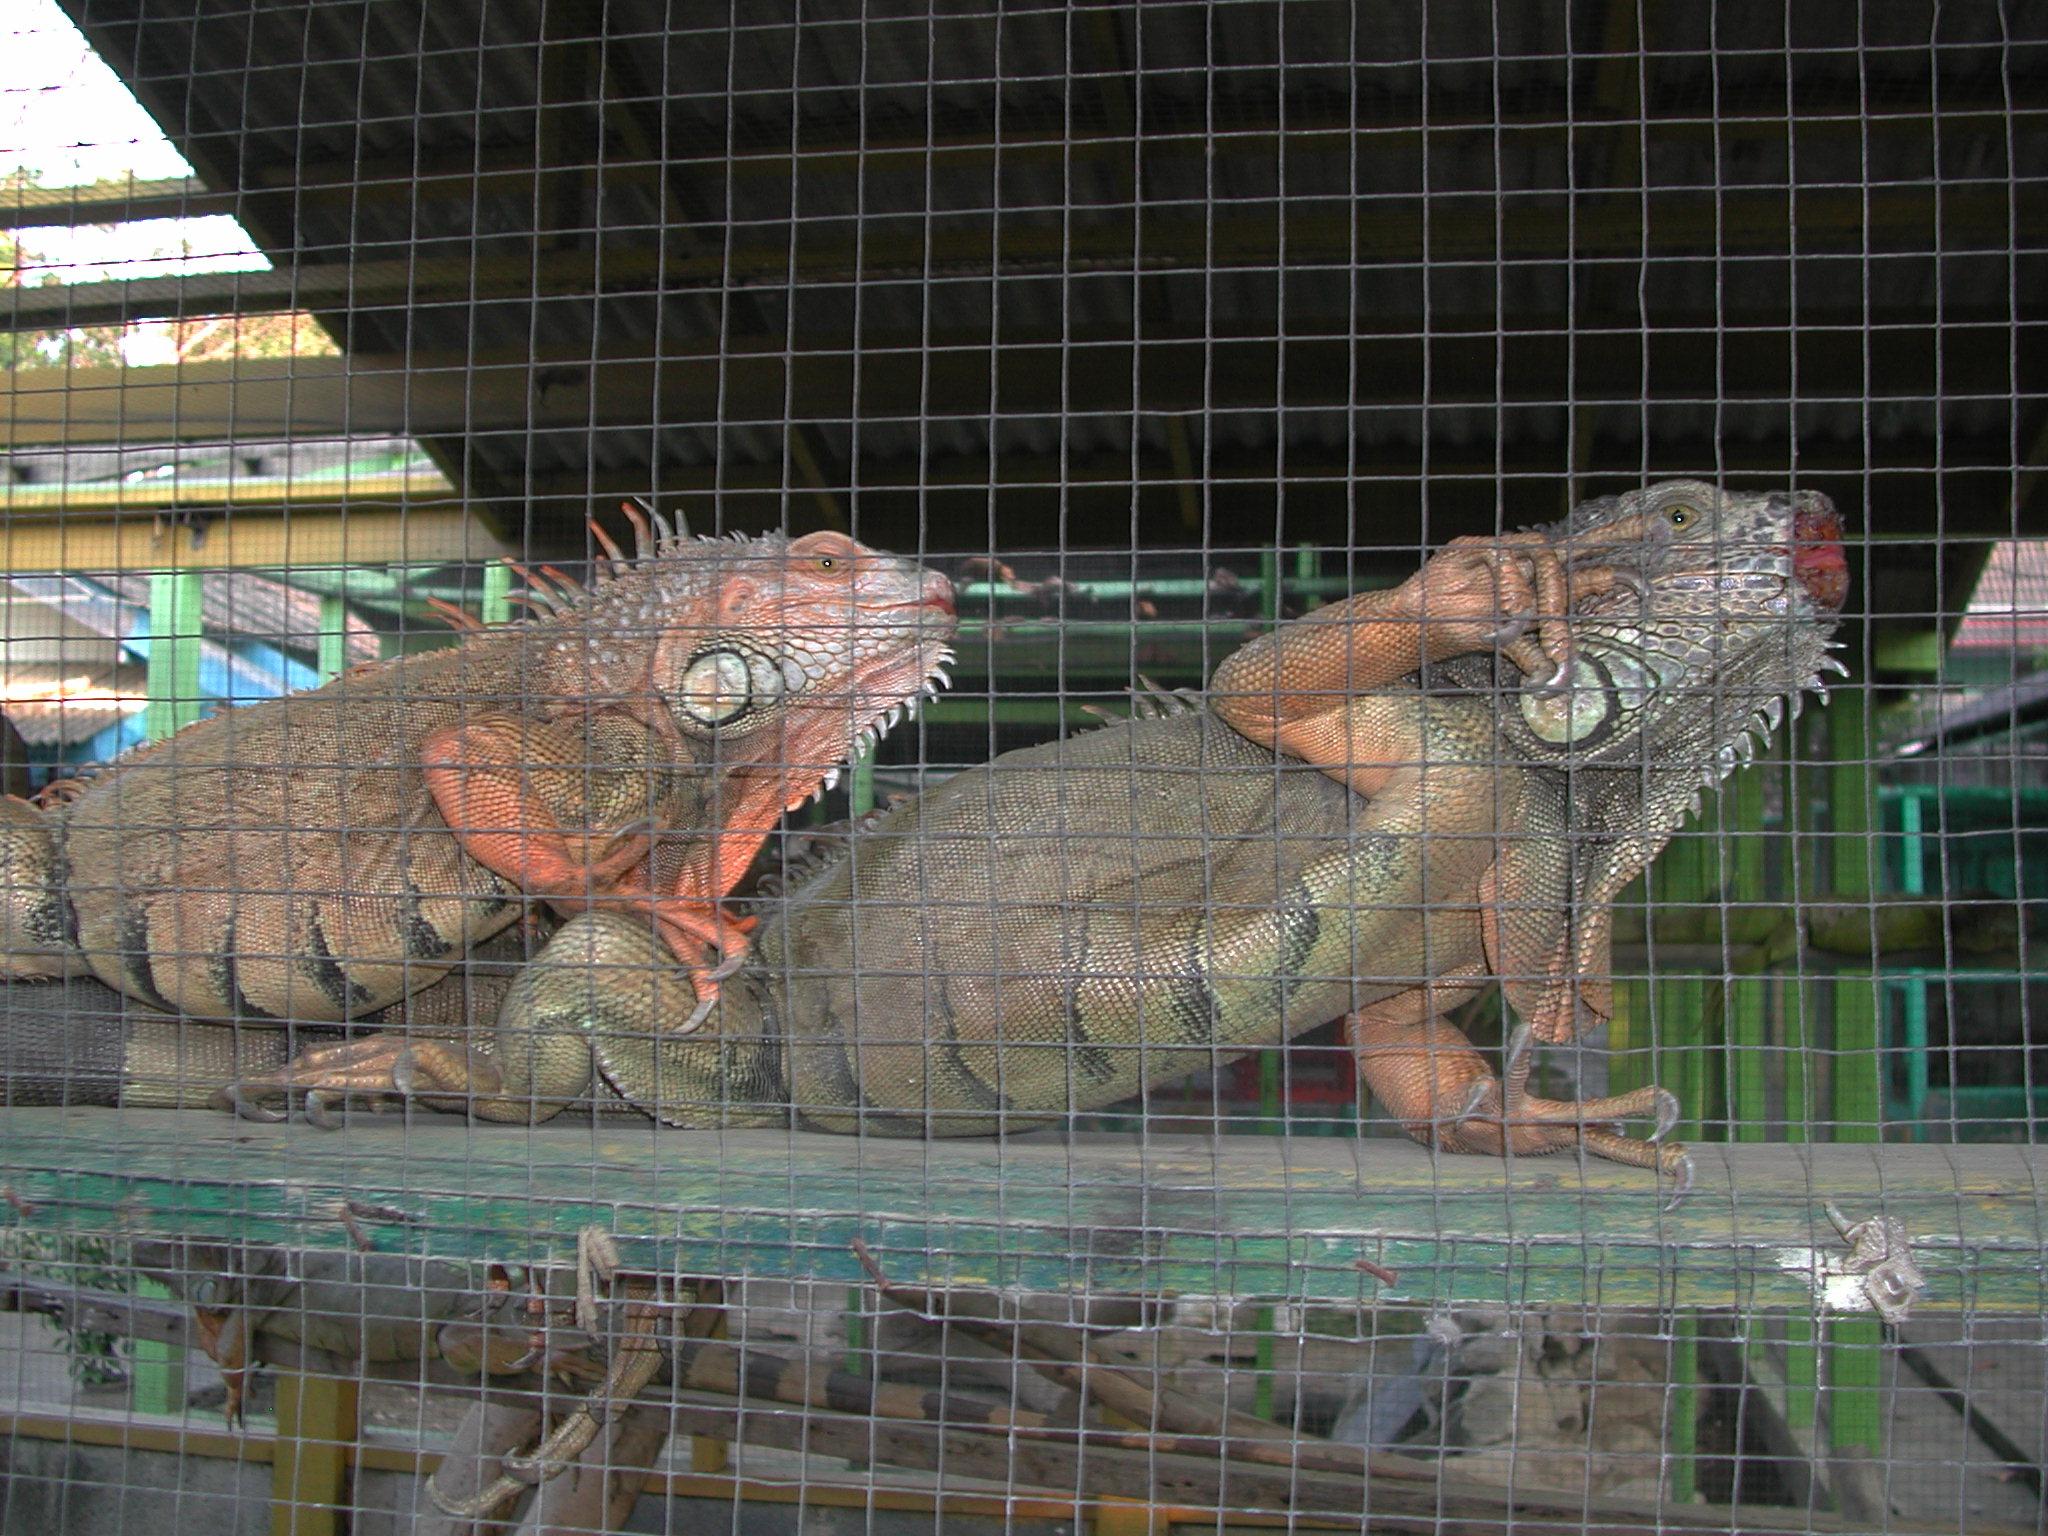 dscn3388.jpg - Iguanas